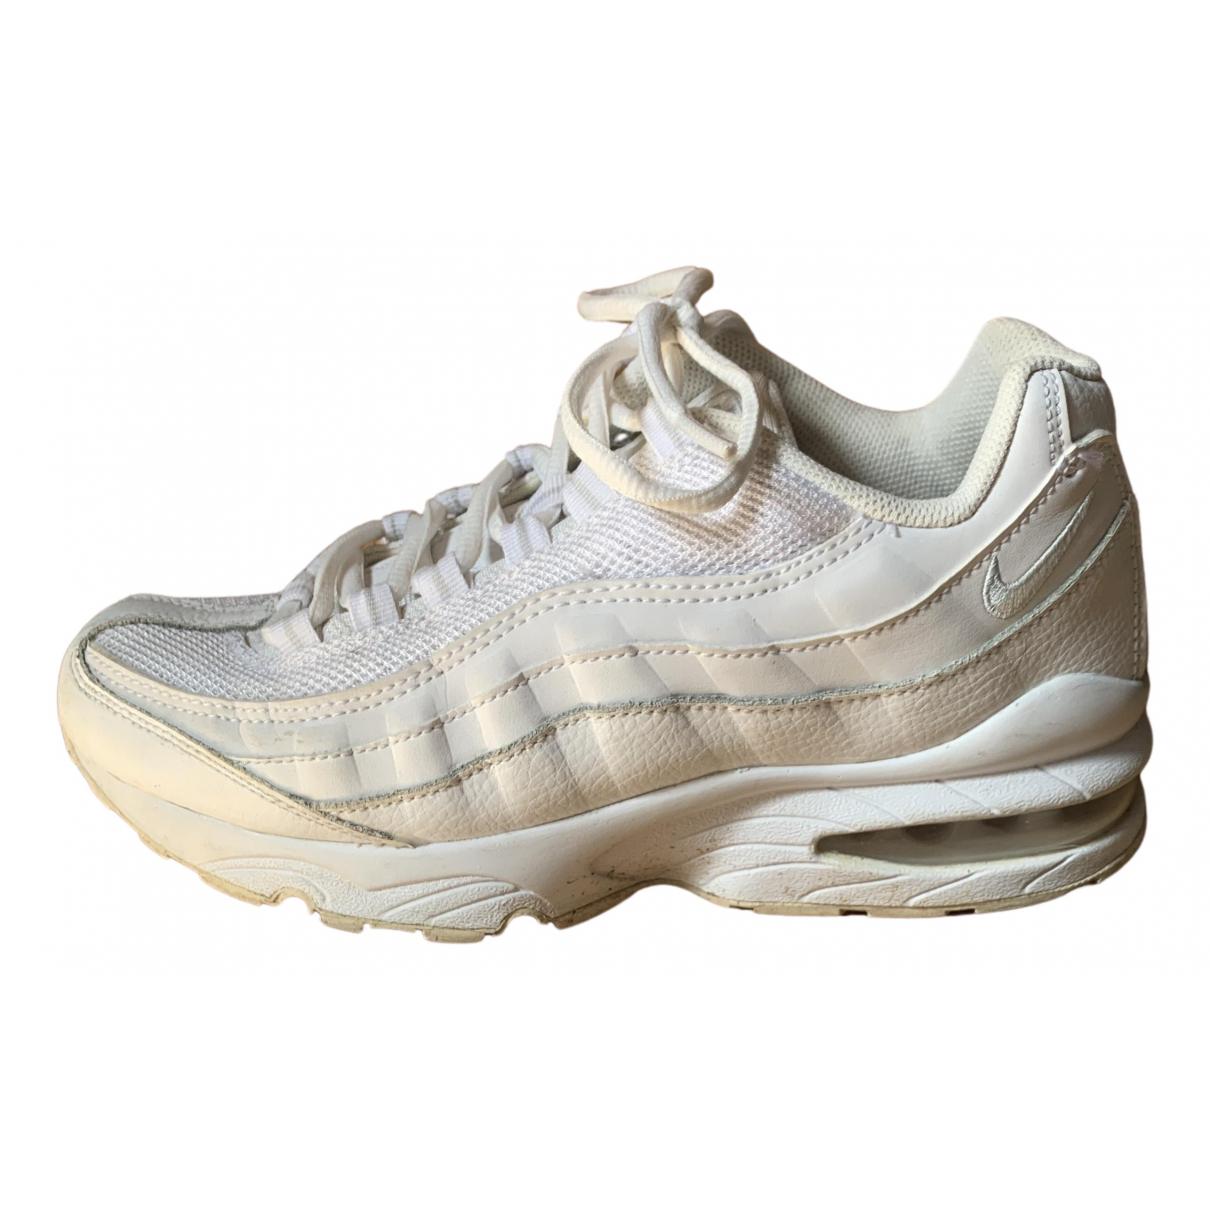 Nike Air Max 95 White Cloth Trainers for Women 37.5 EU